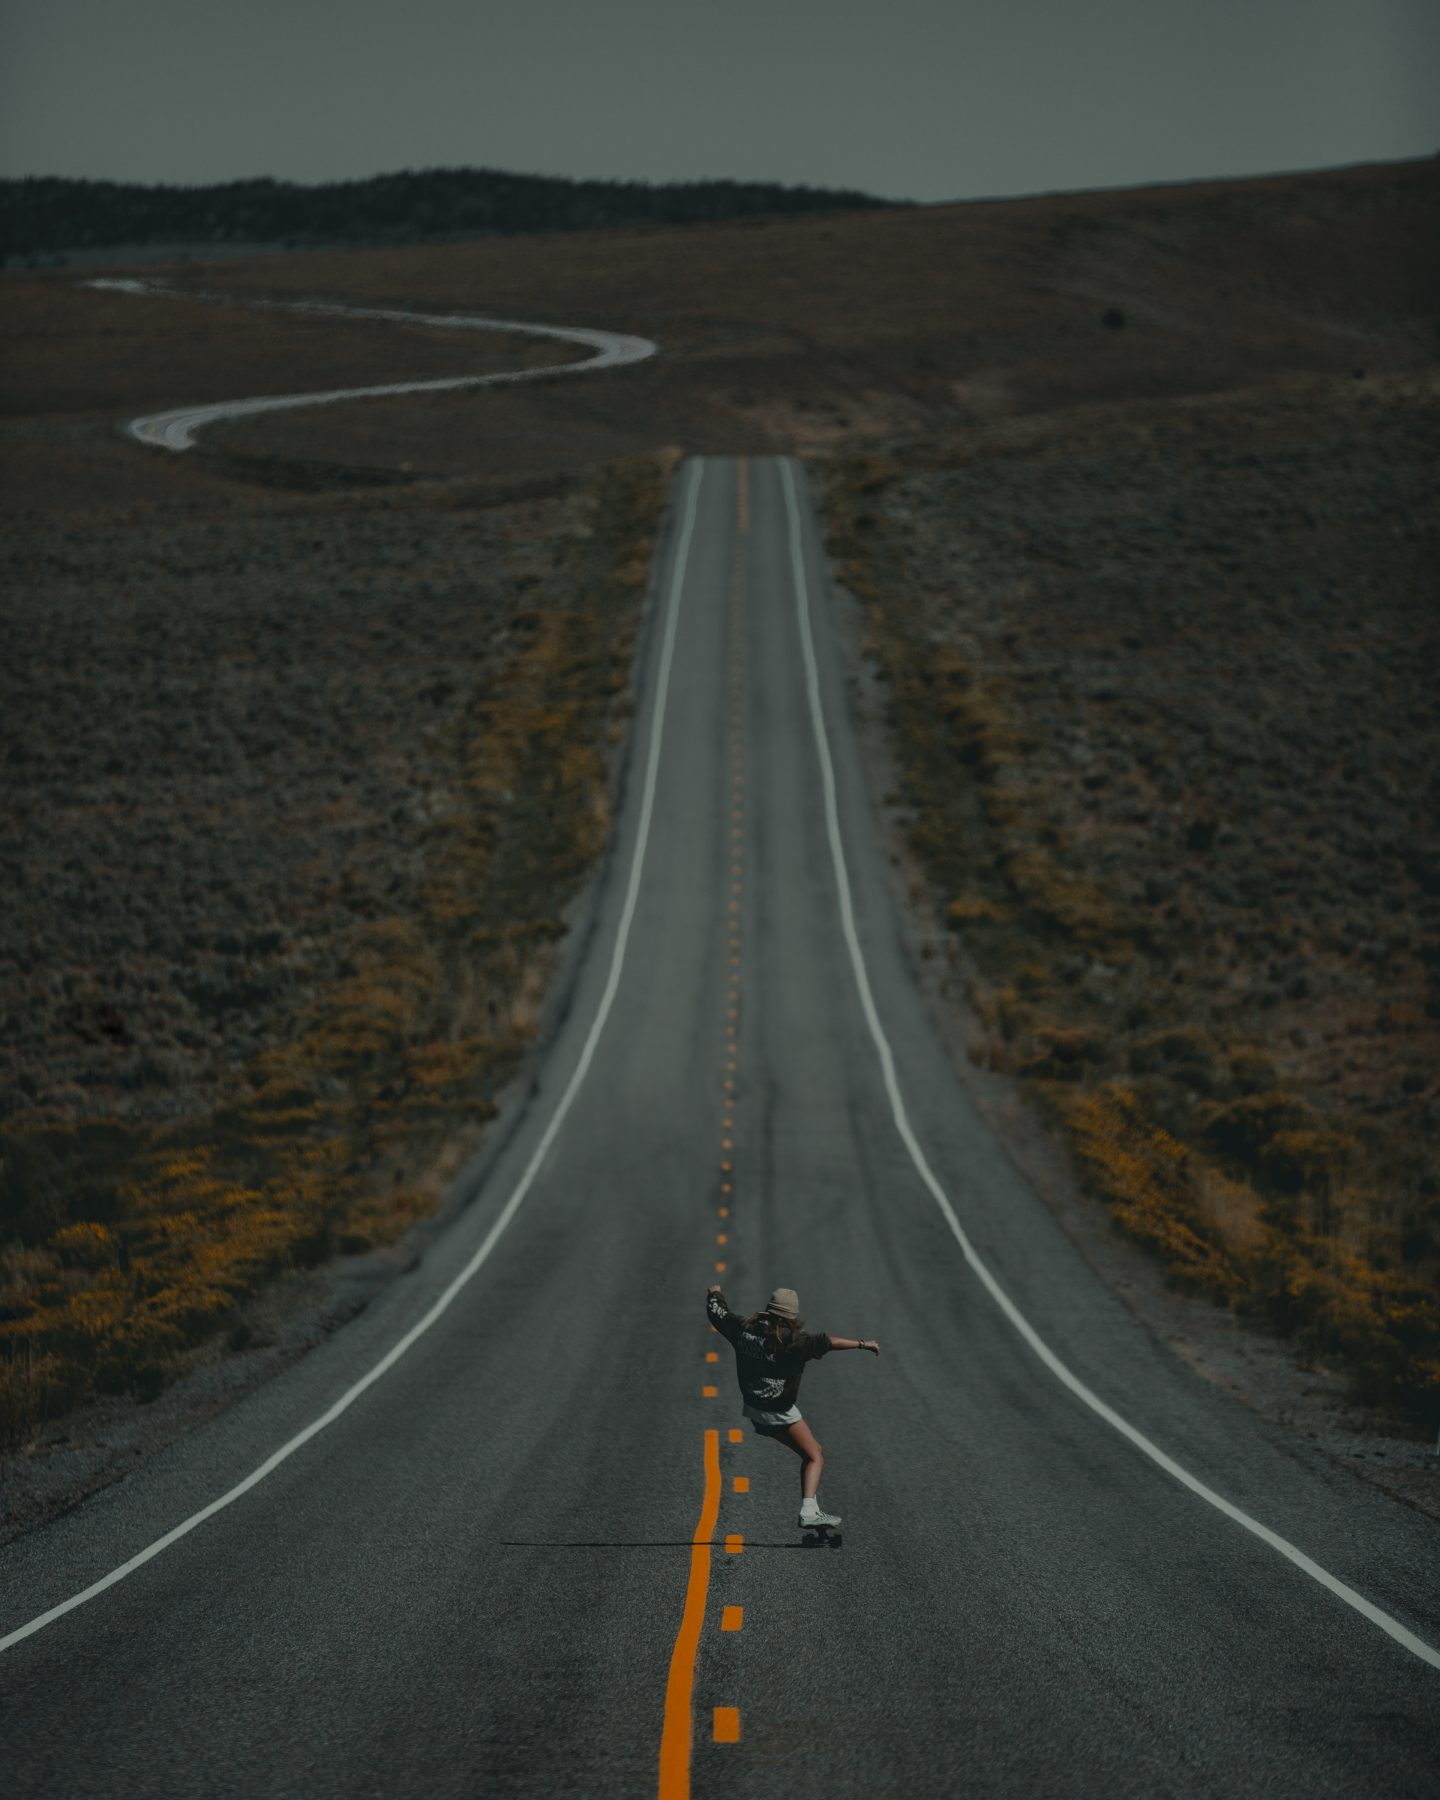 Woman skateboards down the road in Utah